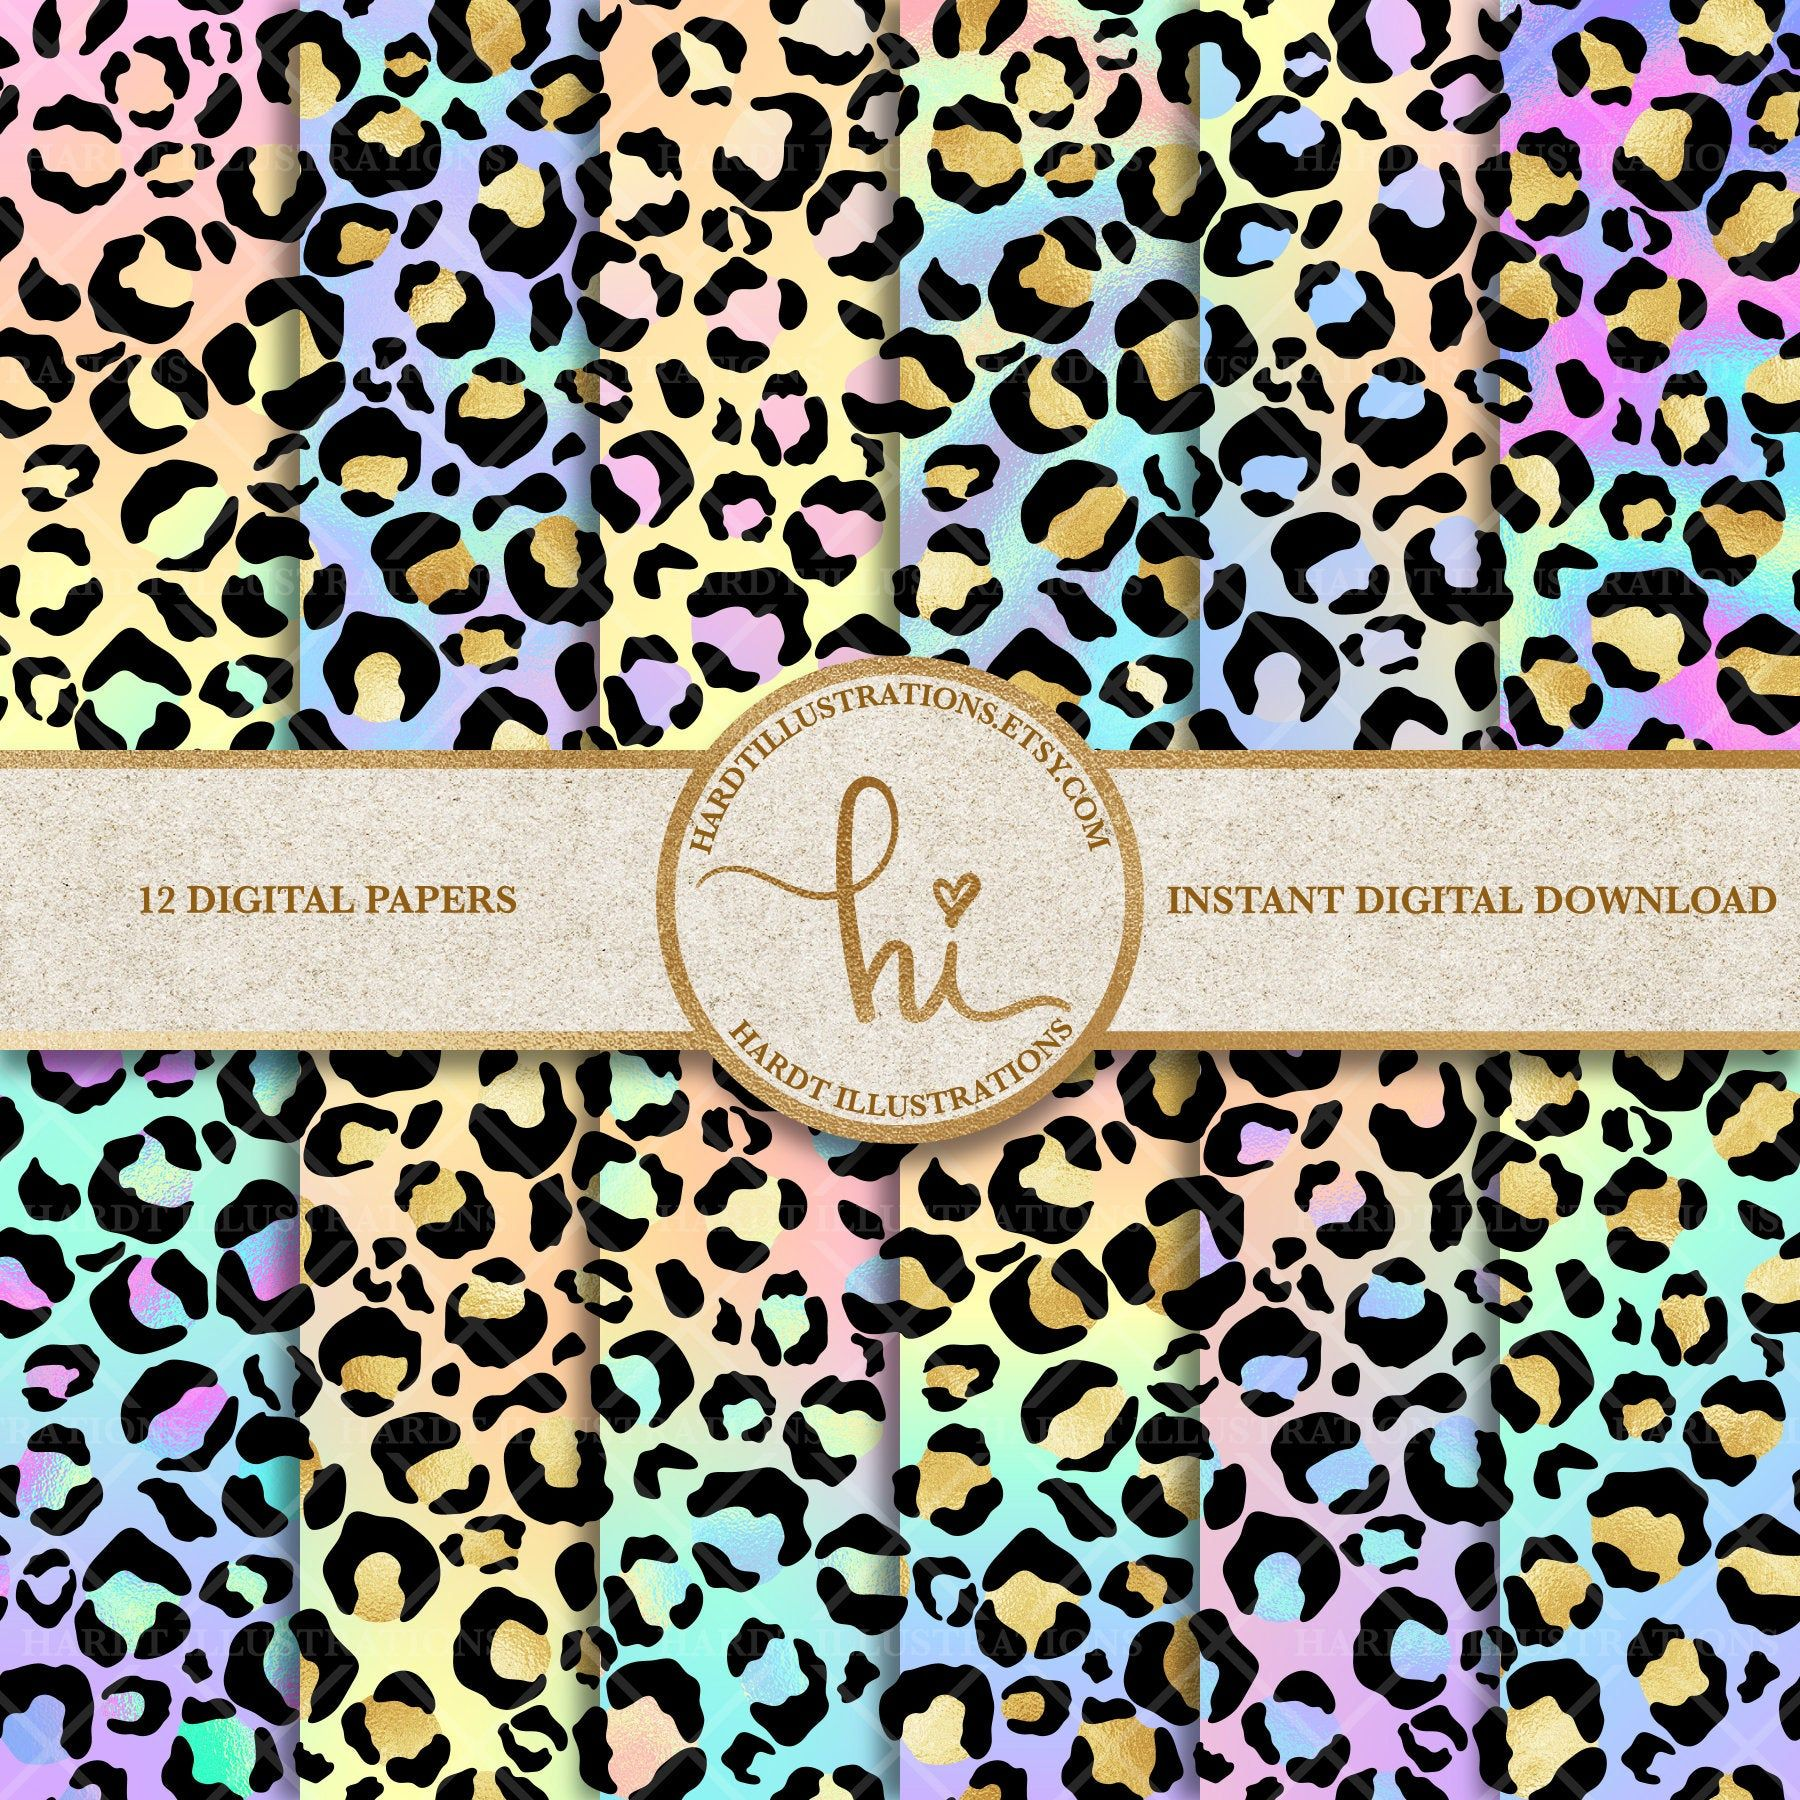 Pastel Leopard Print Digital Paper Holographic Rainbow Etsy In 2020 Digital Paper Original Art Prints Cute Scrapbooks